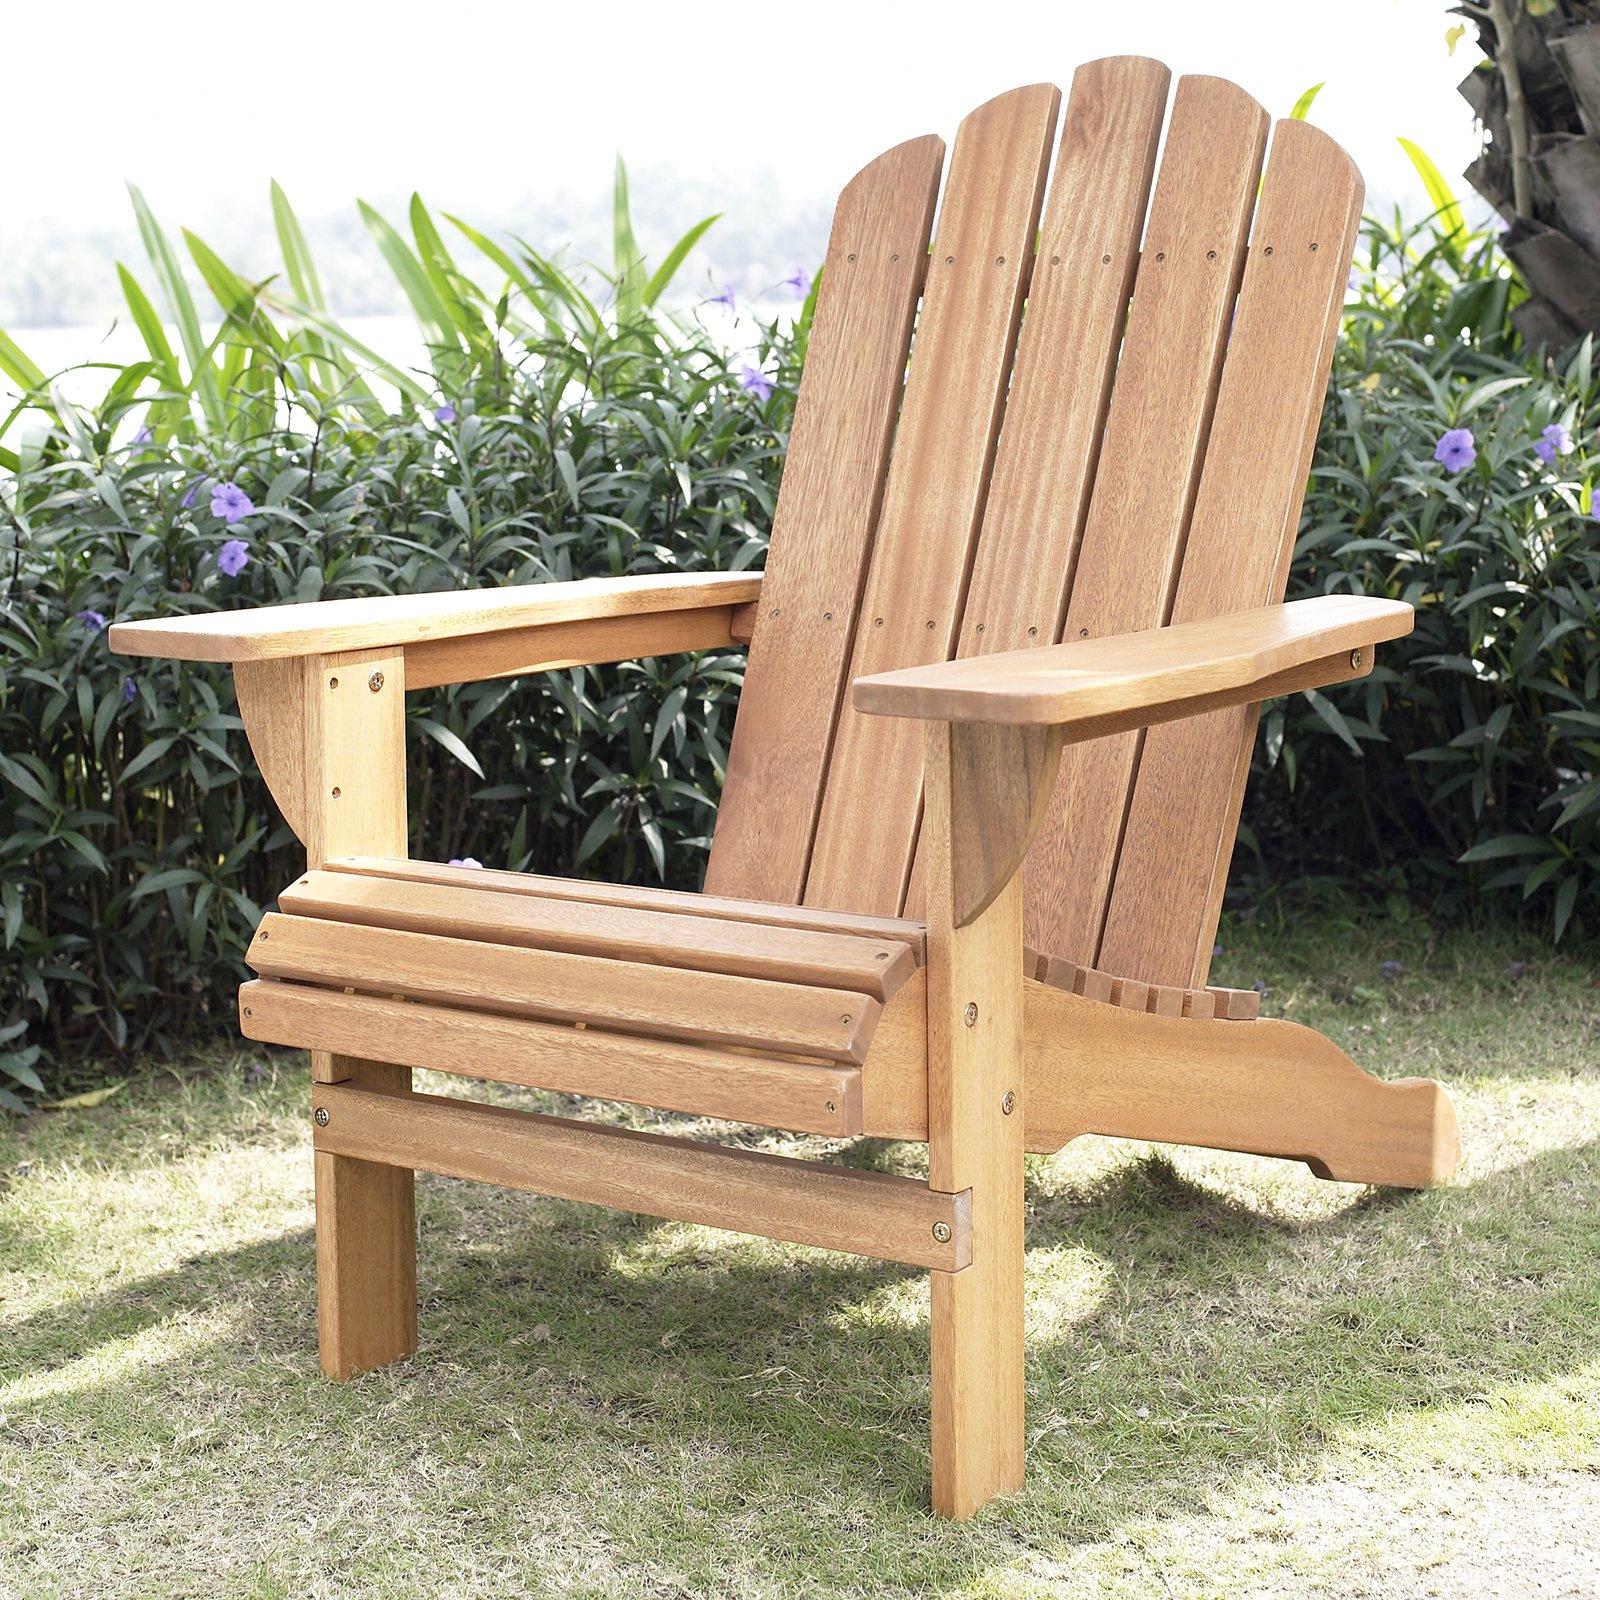 adirondack chairs belham living shoreline adirondack chair - natural - walmart.com HGFNUWK